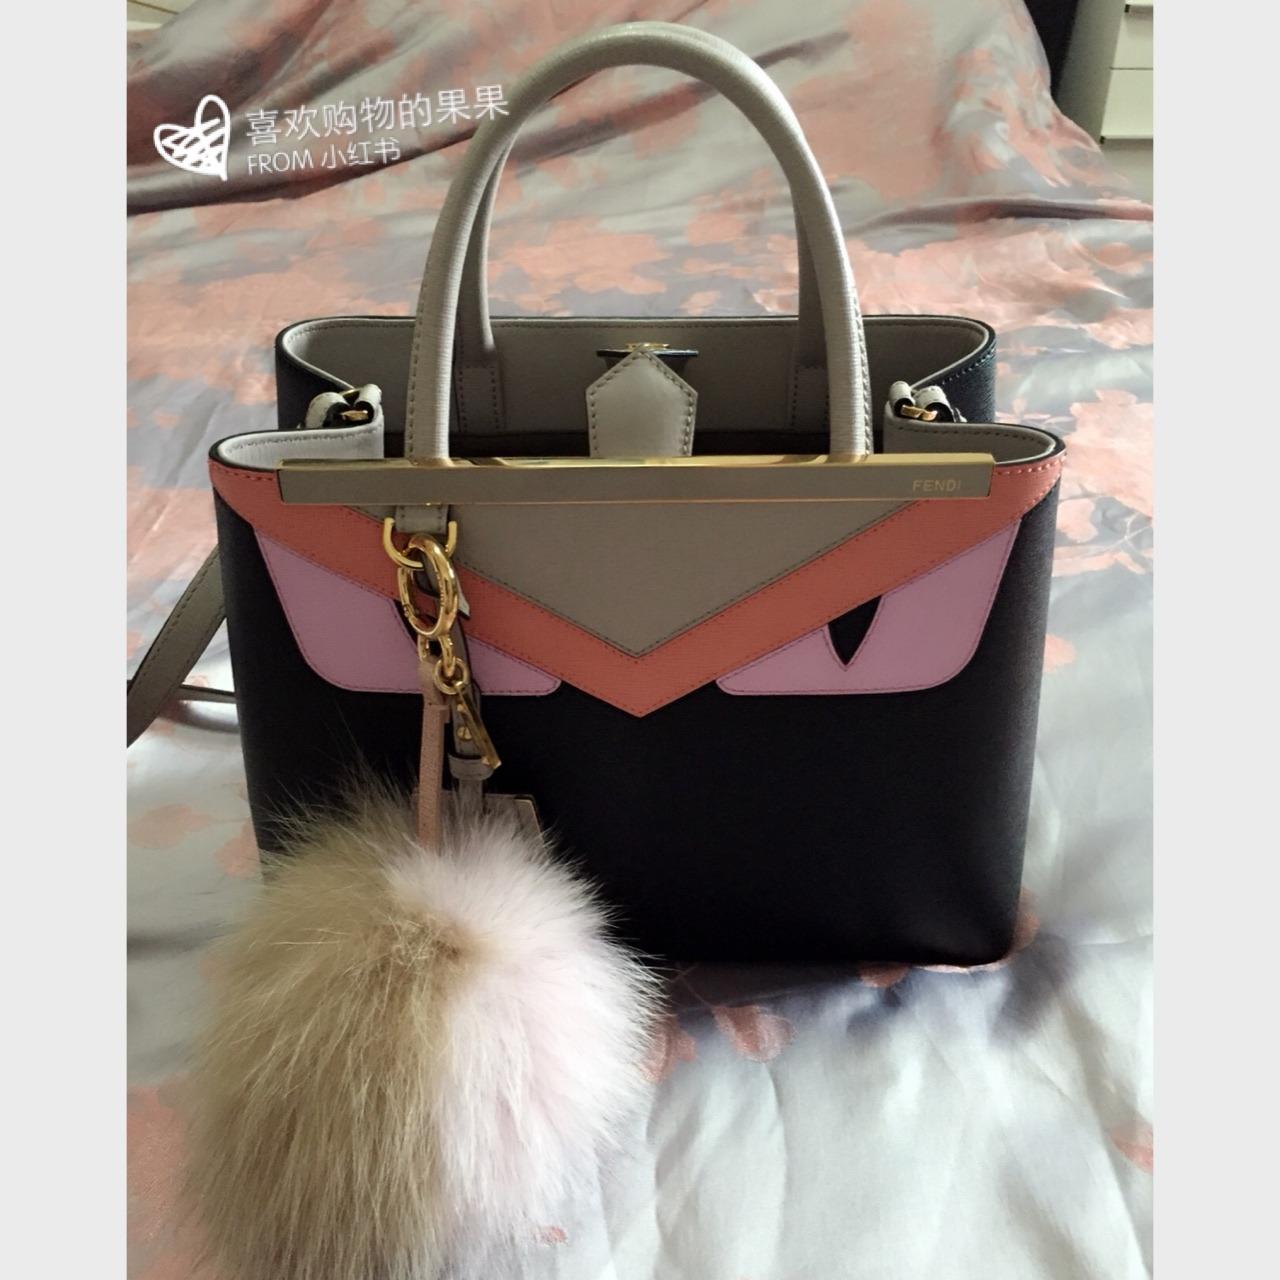 fendi包包:一上货就抢没的包包_价格_怎么样_fendi_芬迪_香港买什么